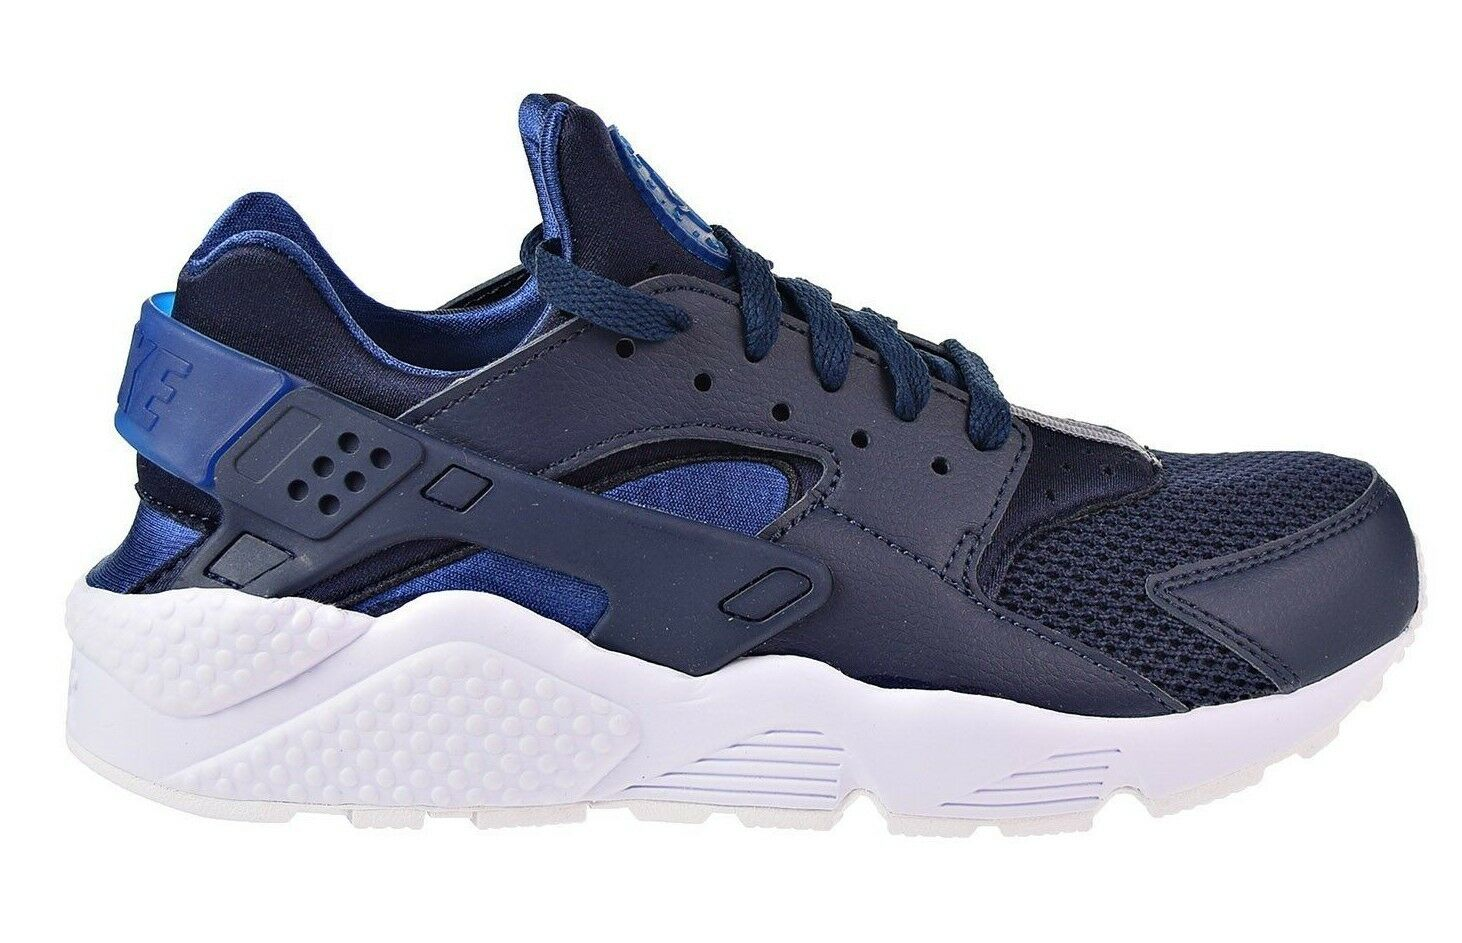 Nike running schuhe für männer air huarache obsidian weiße / fitness, blau - weiße obsidian 318429-420 c c255e8